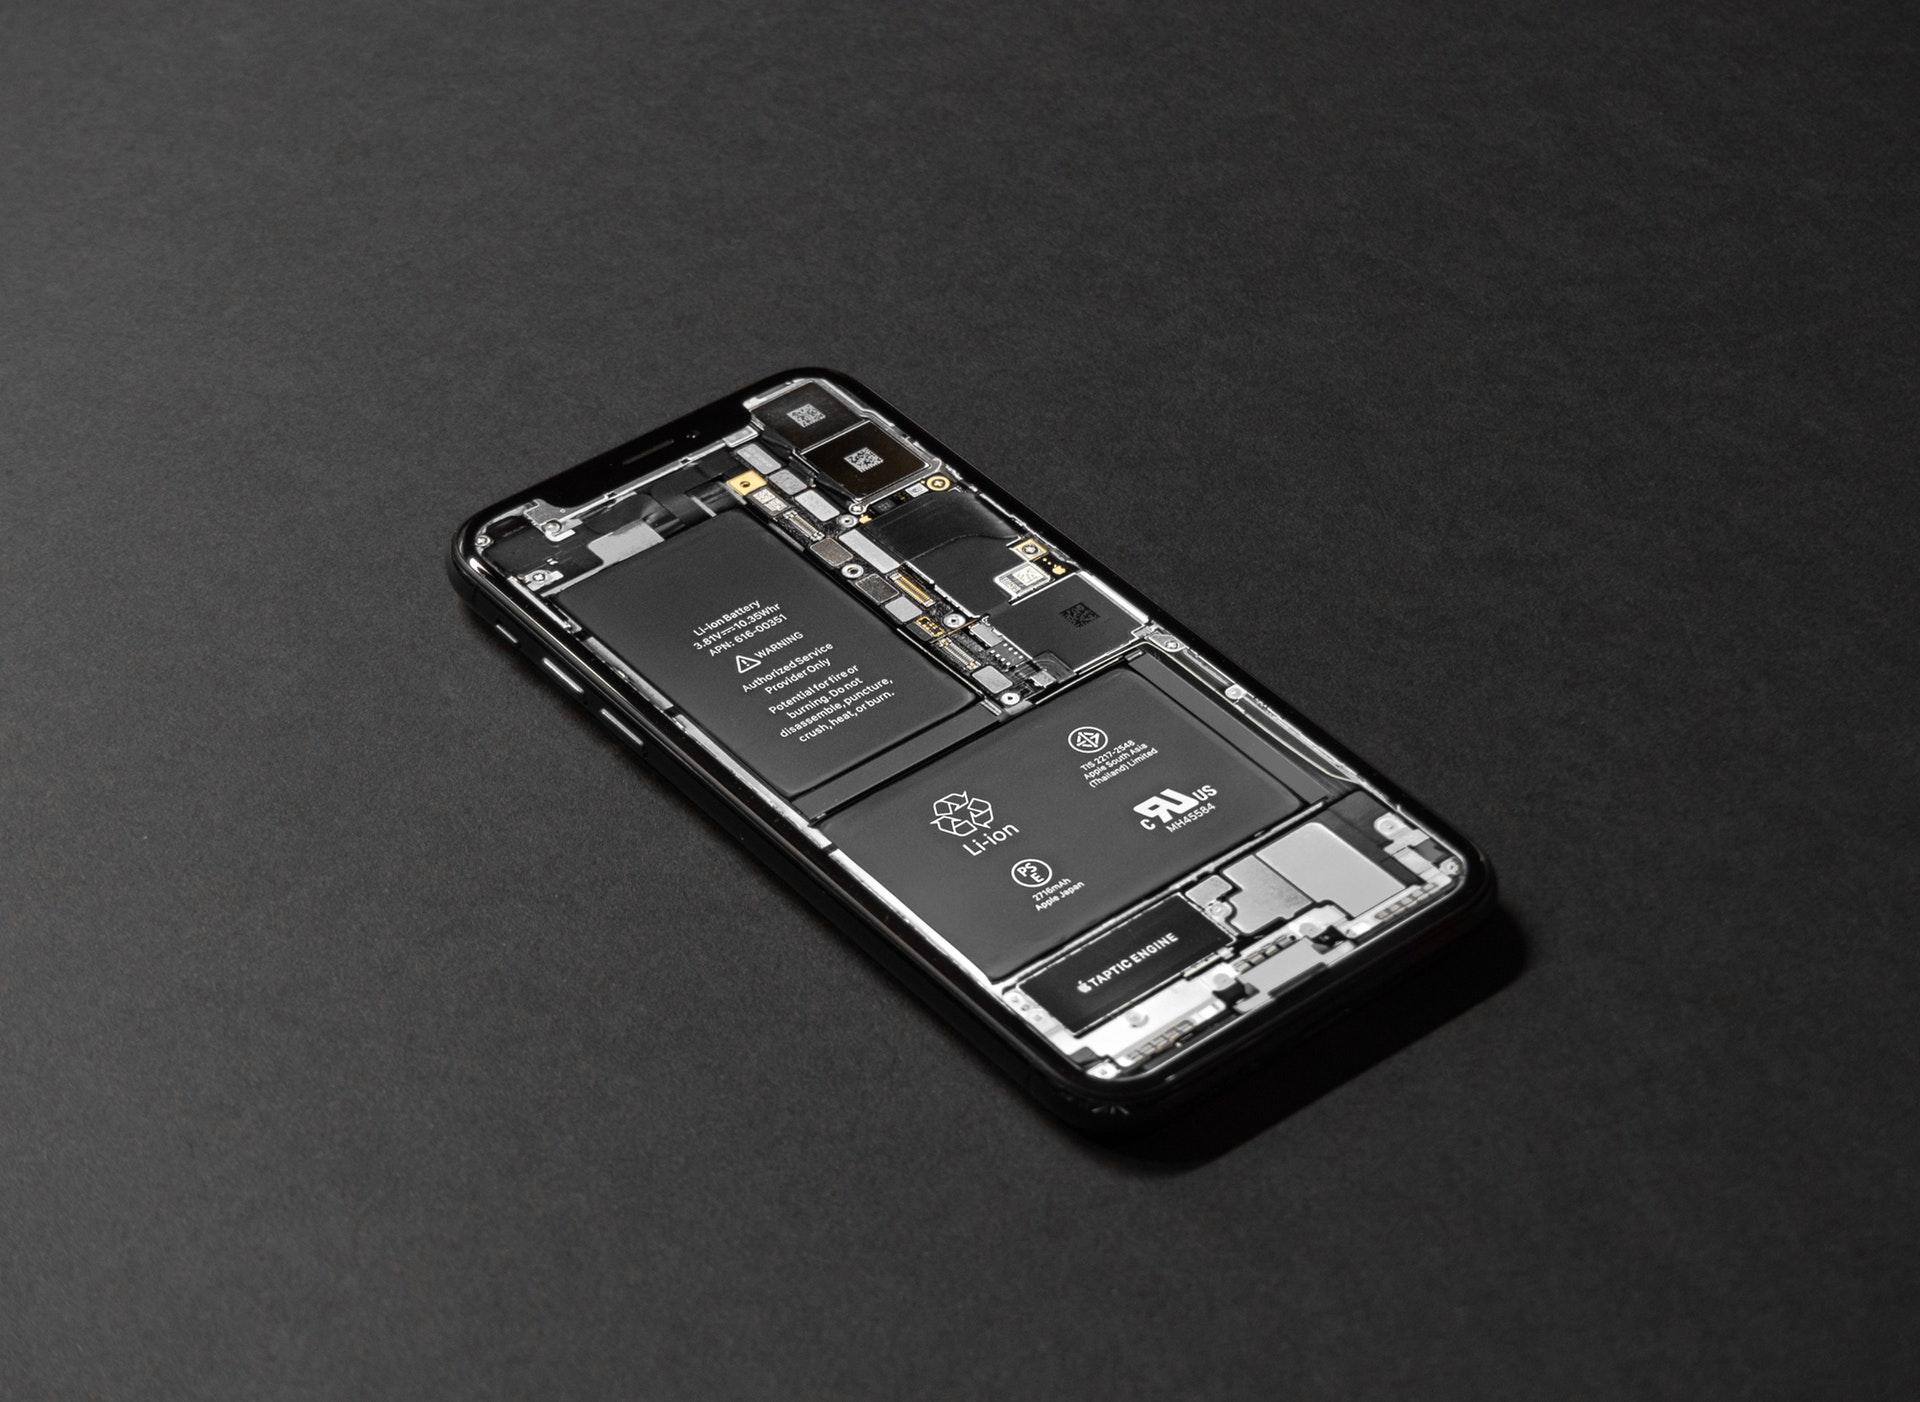 iPhoneがフリーズして再起動・強制終了できない?画面が固まる原因と対処方法